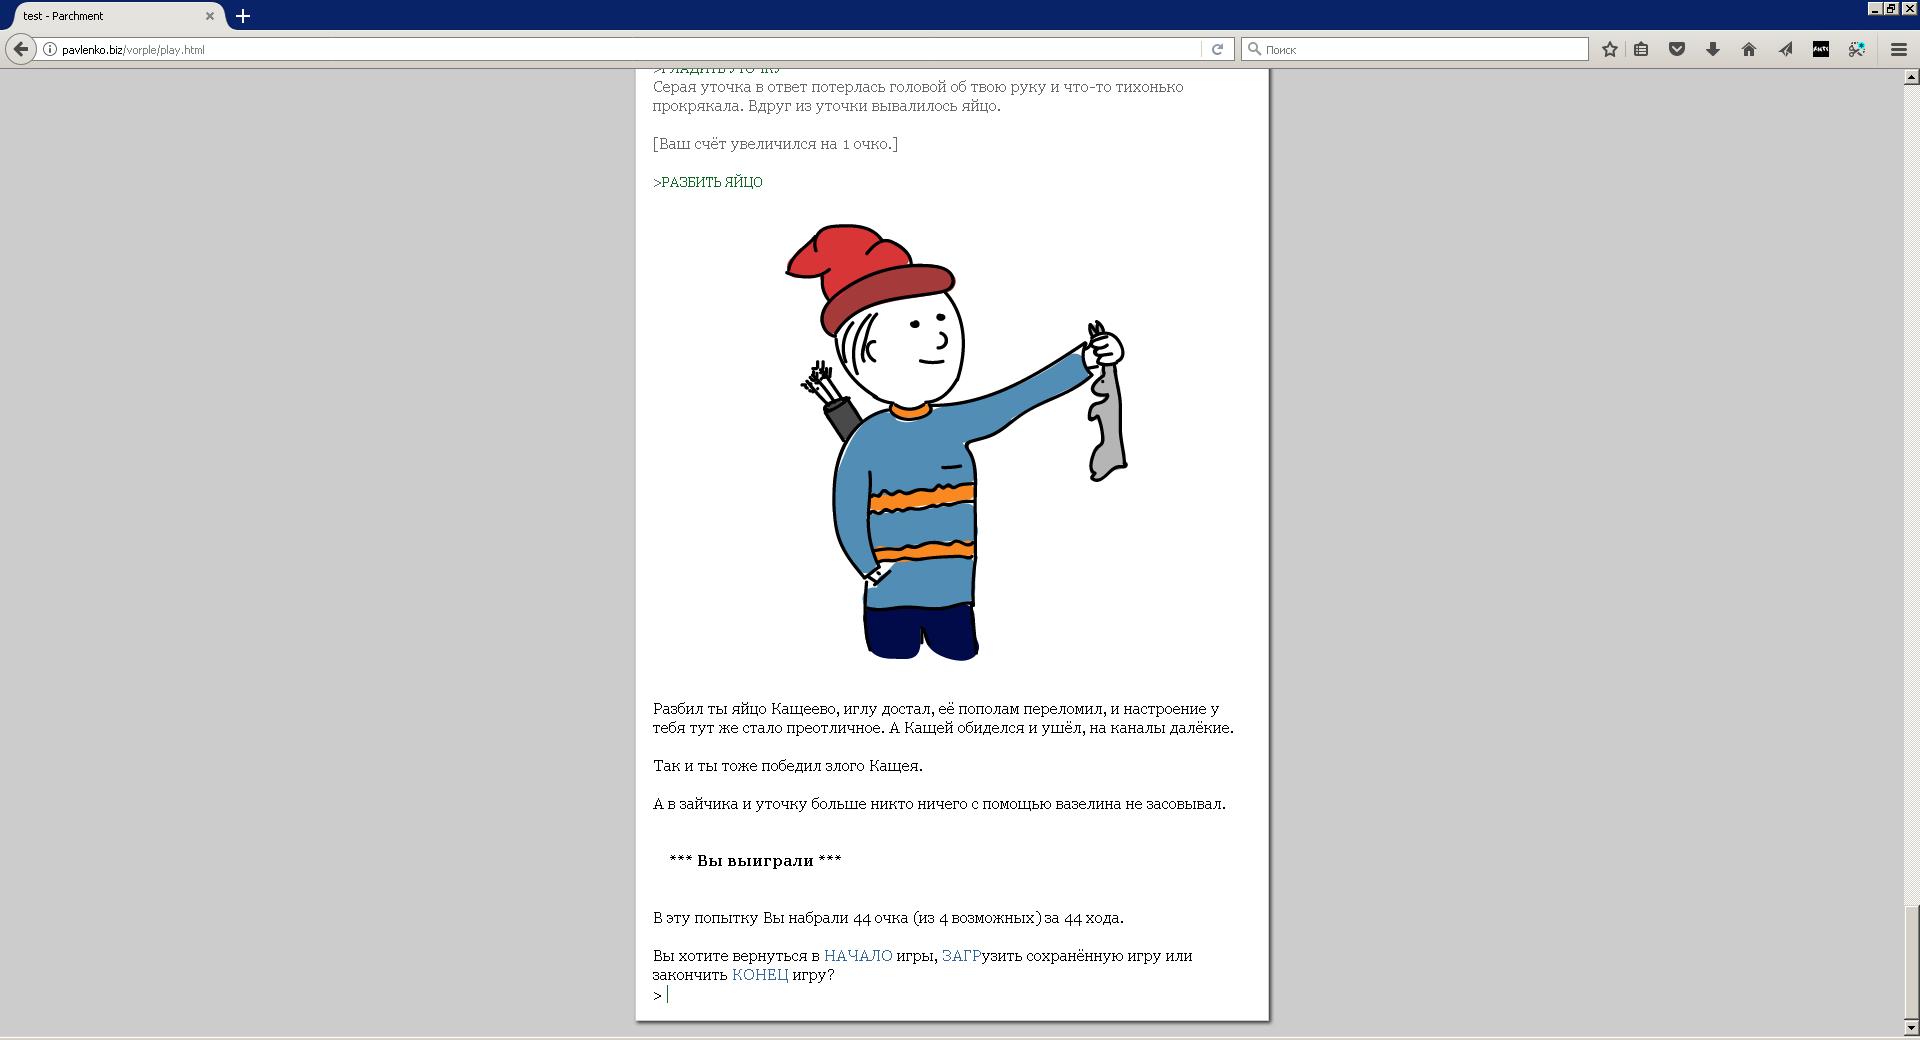 http://ipic.su/img/img7/fs/goraph_fail.1512602680.png